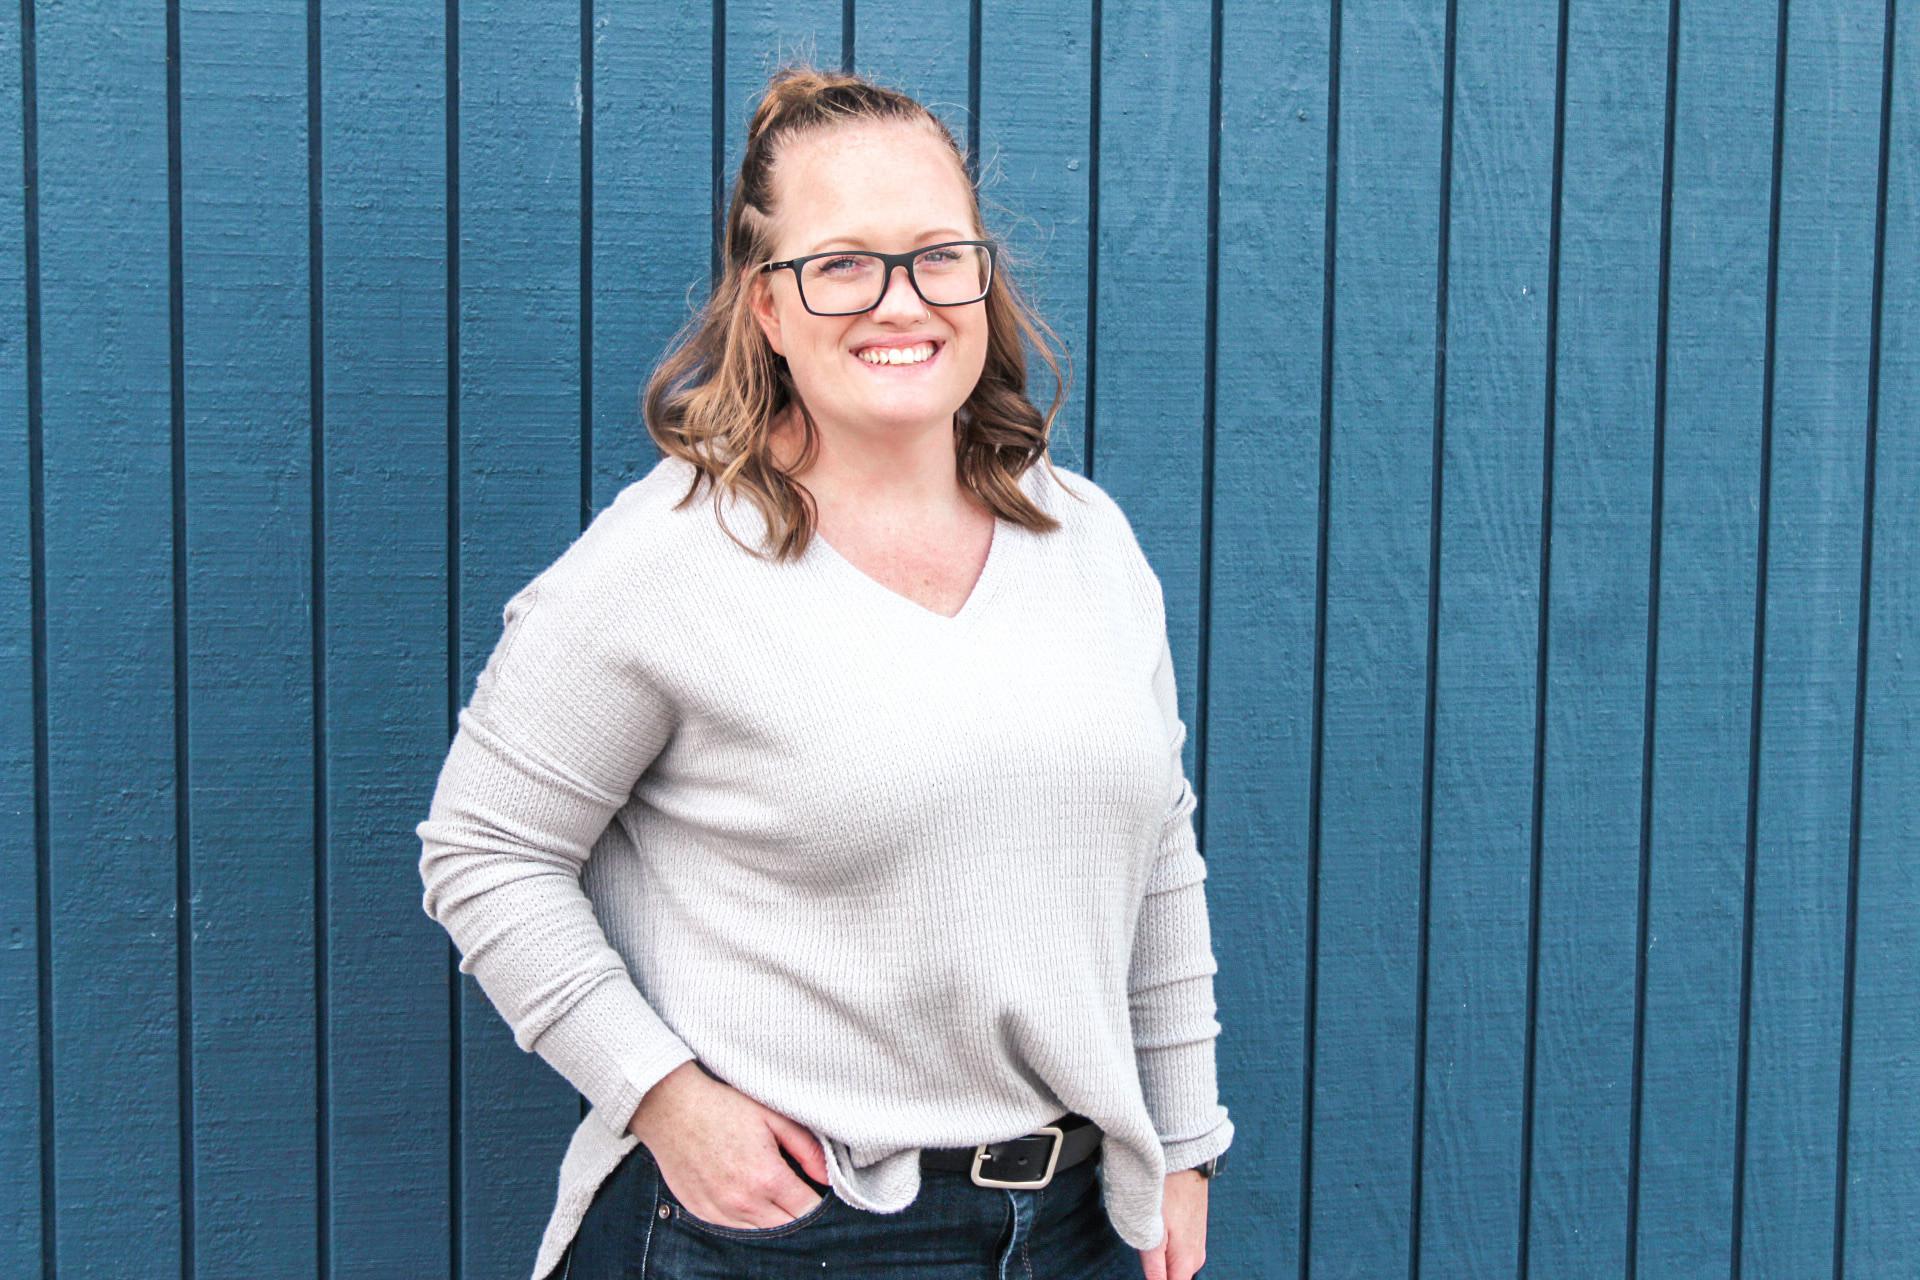 10 Questions with Megan Burton